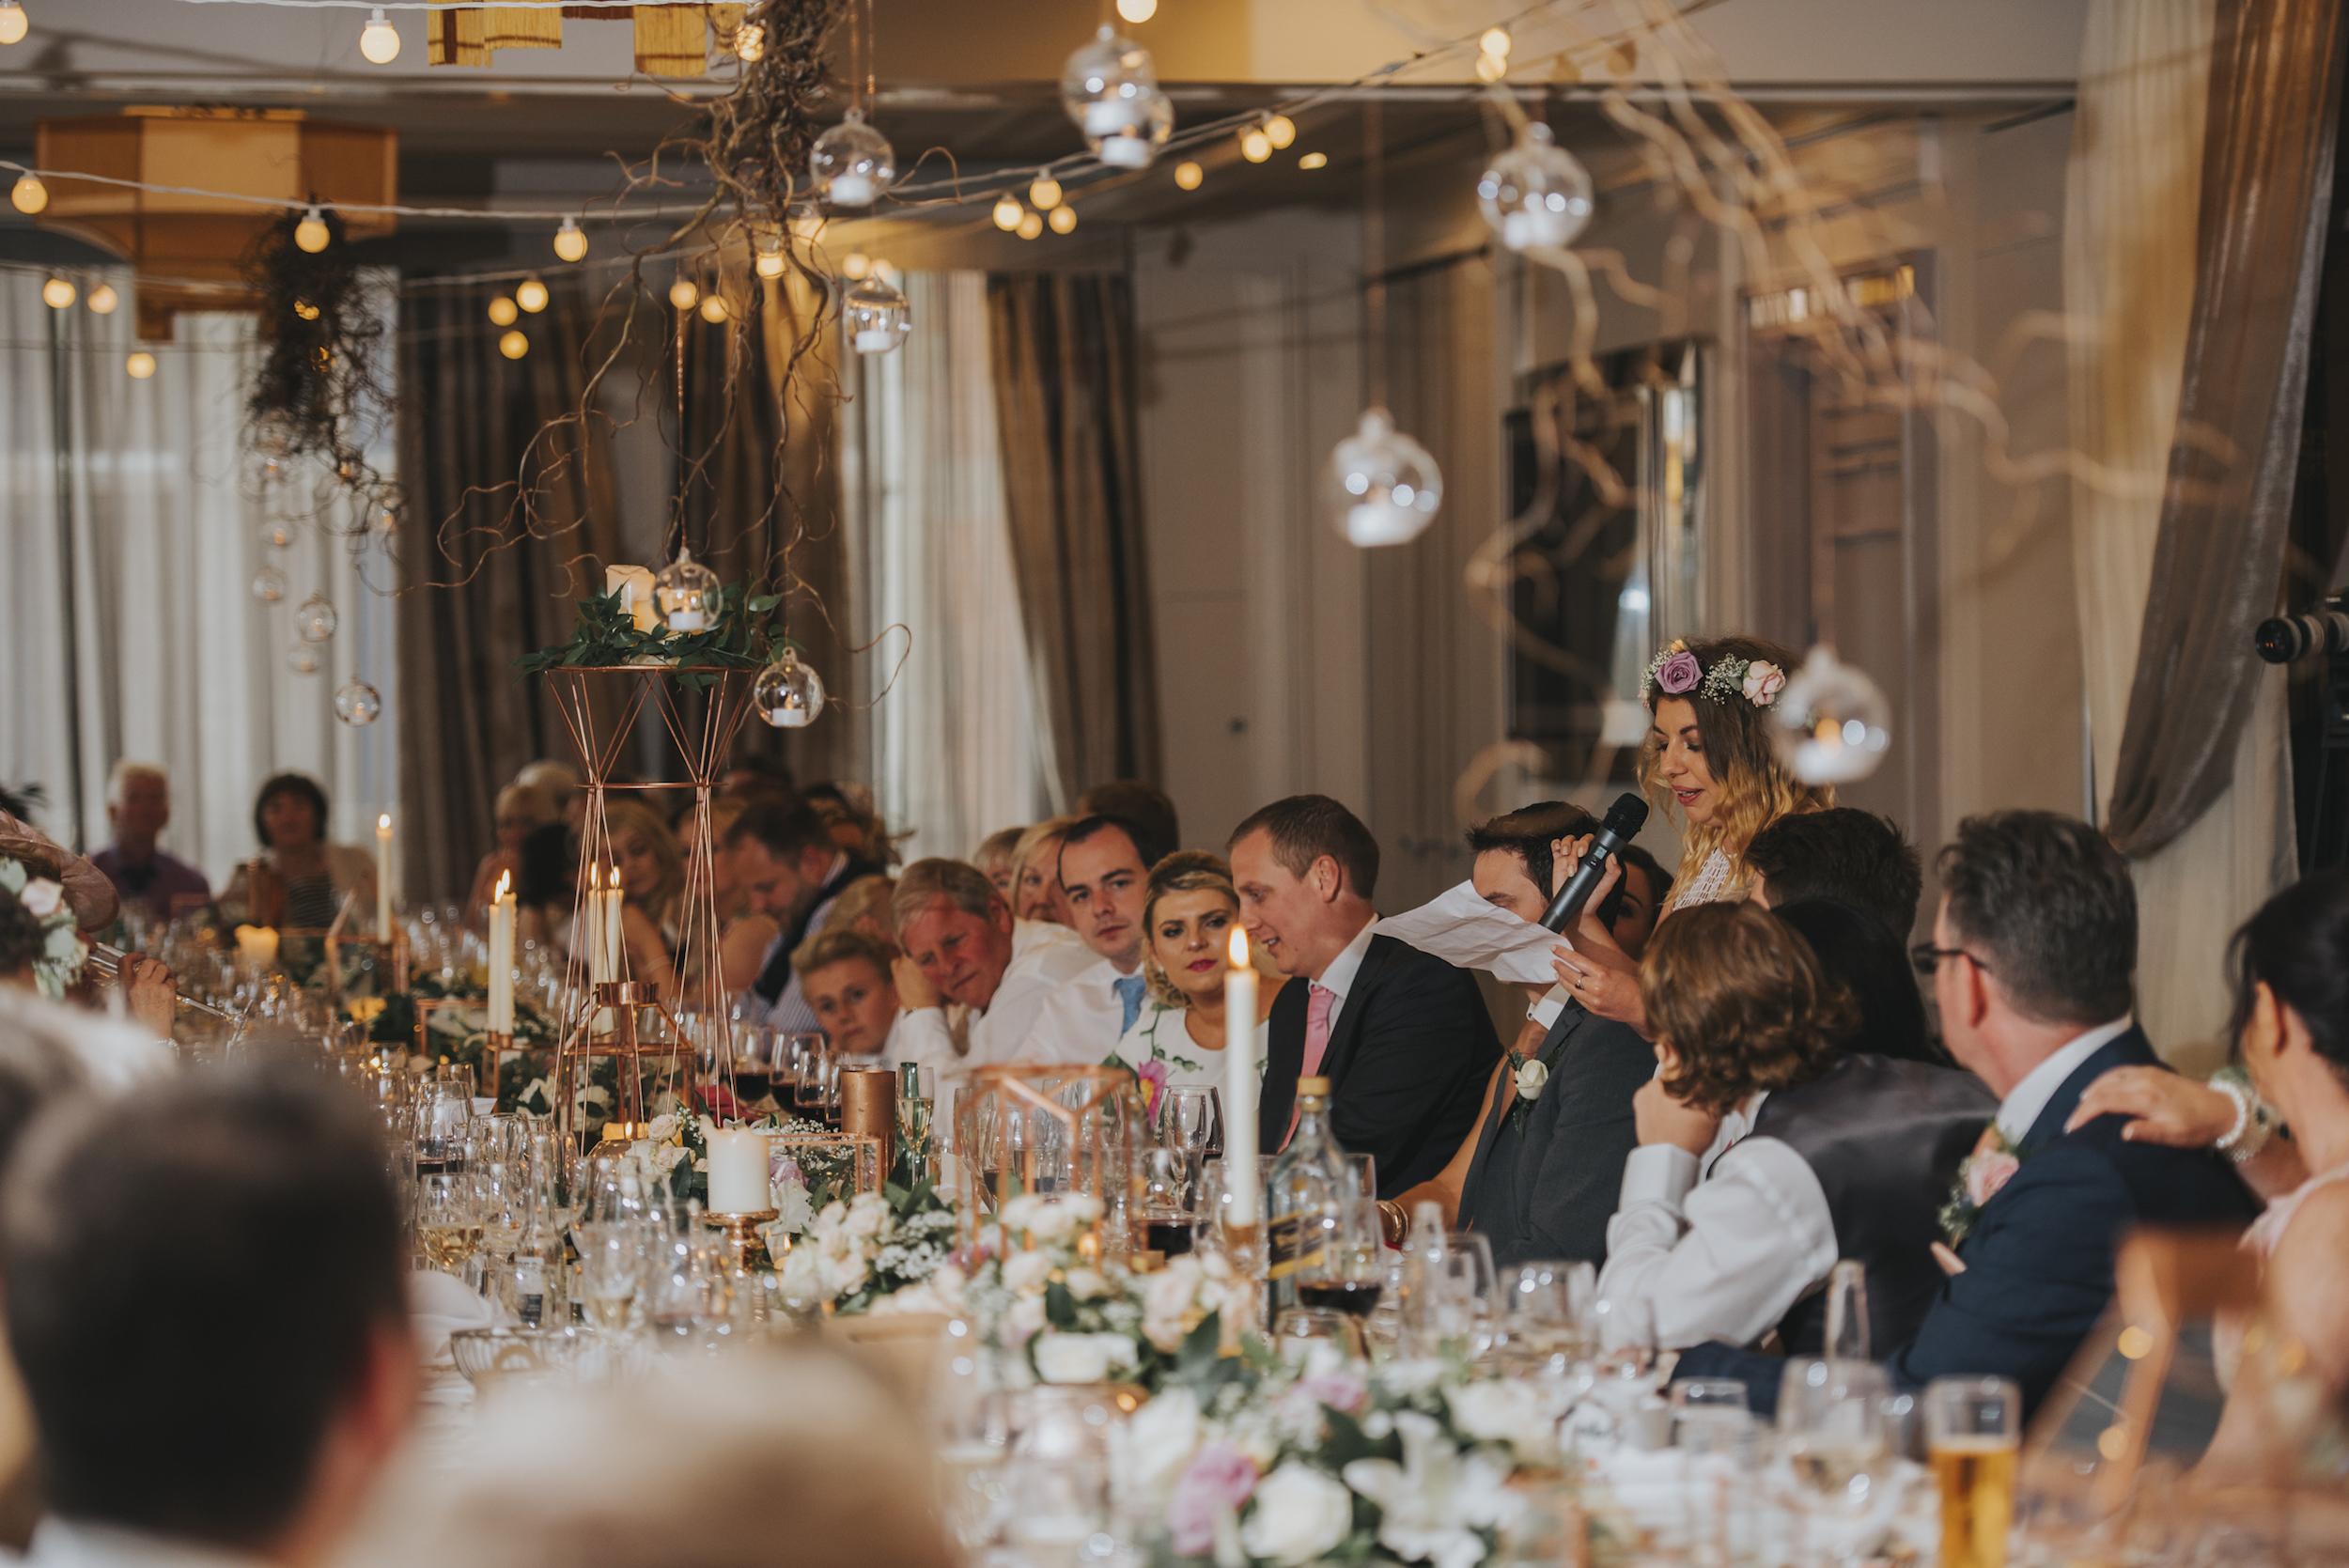 Francis_meaney_photography_merchant_hotel_wedding_belfast_inspire_weddings_12.jpeg